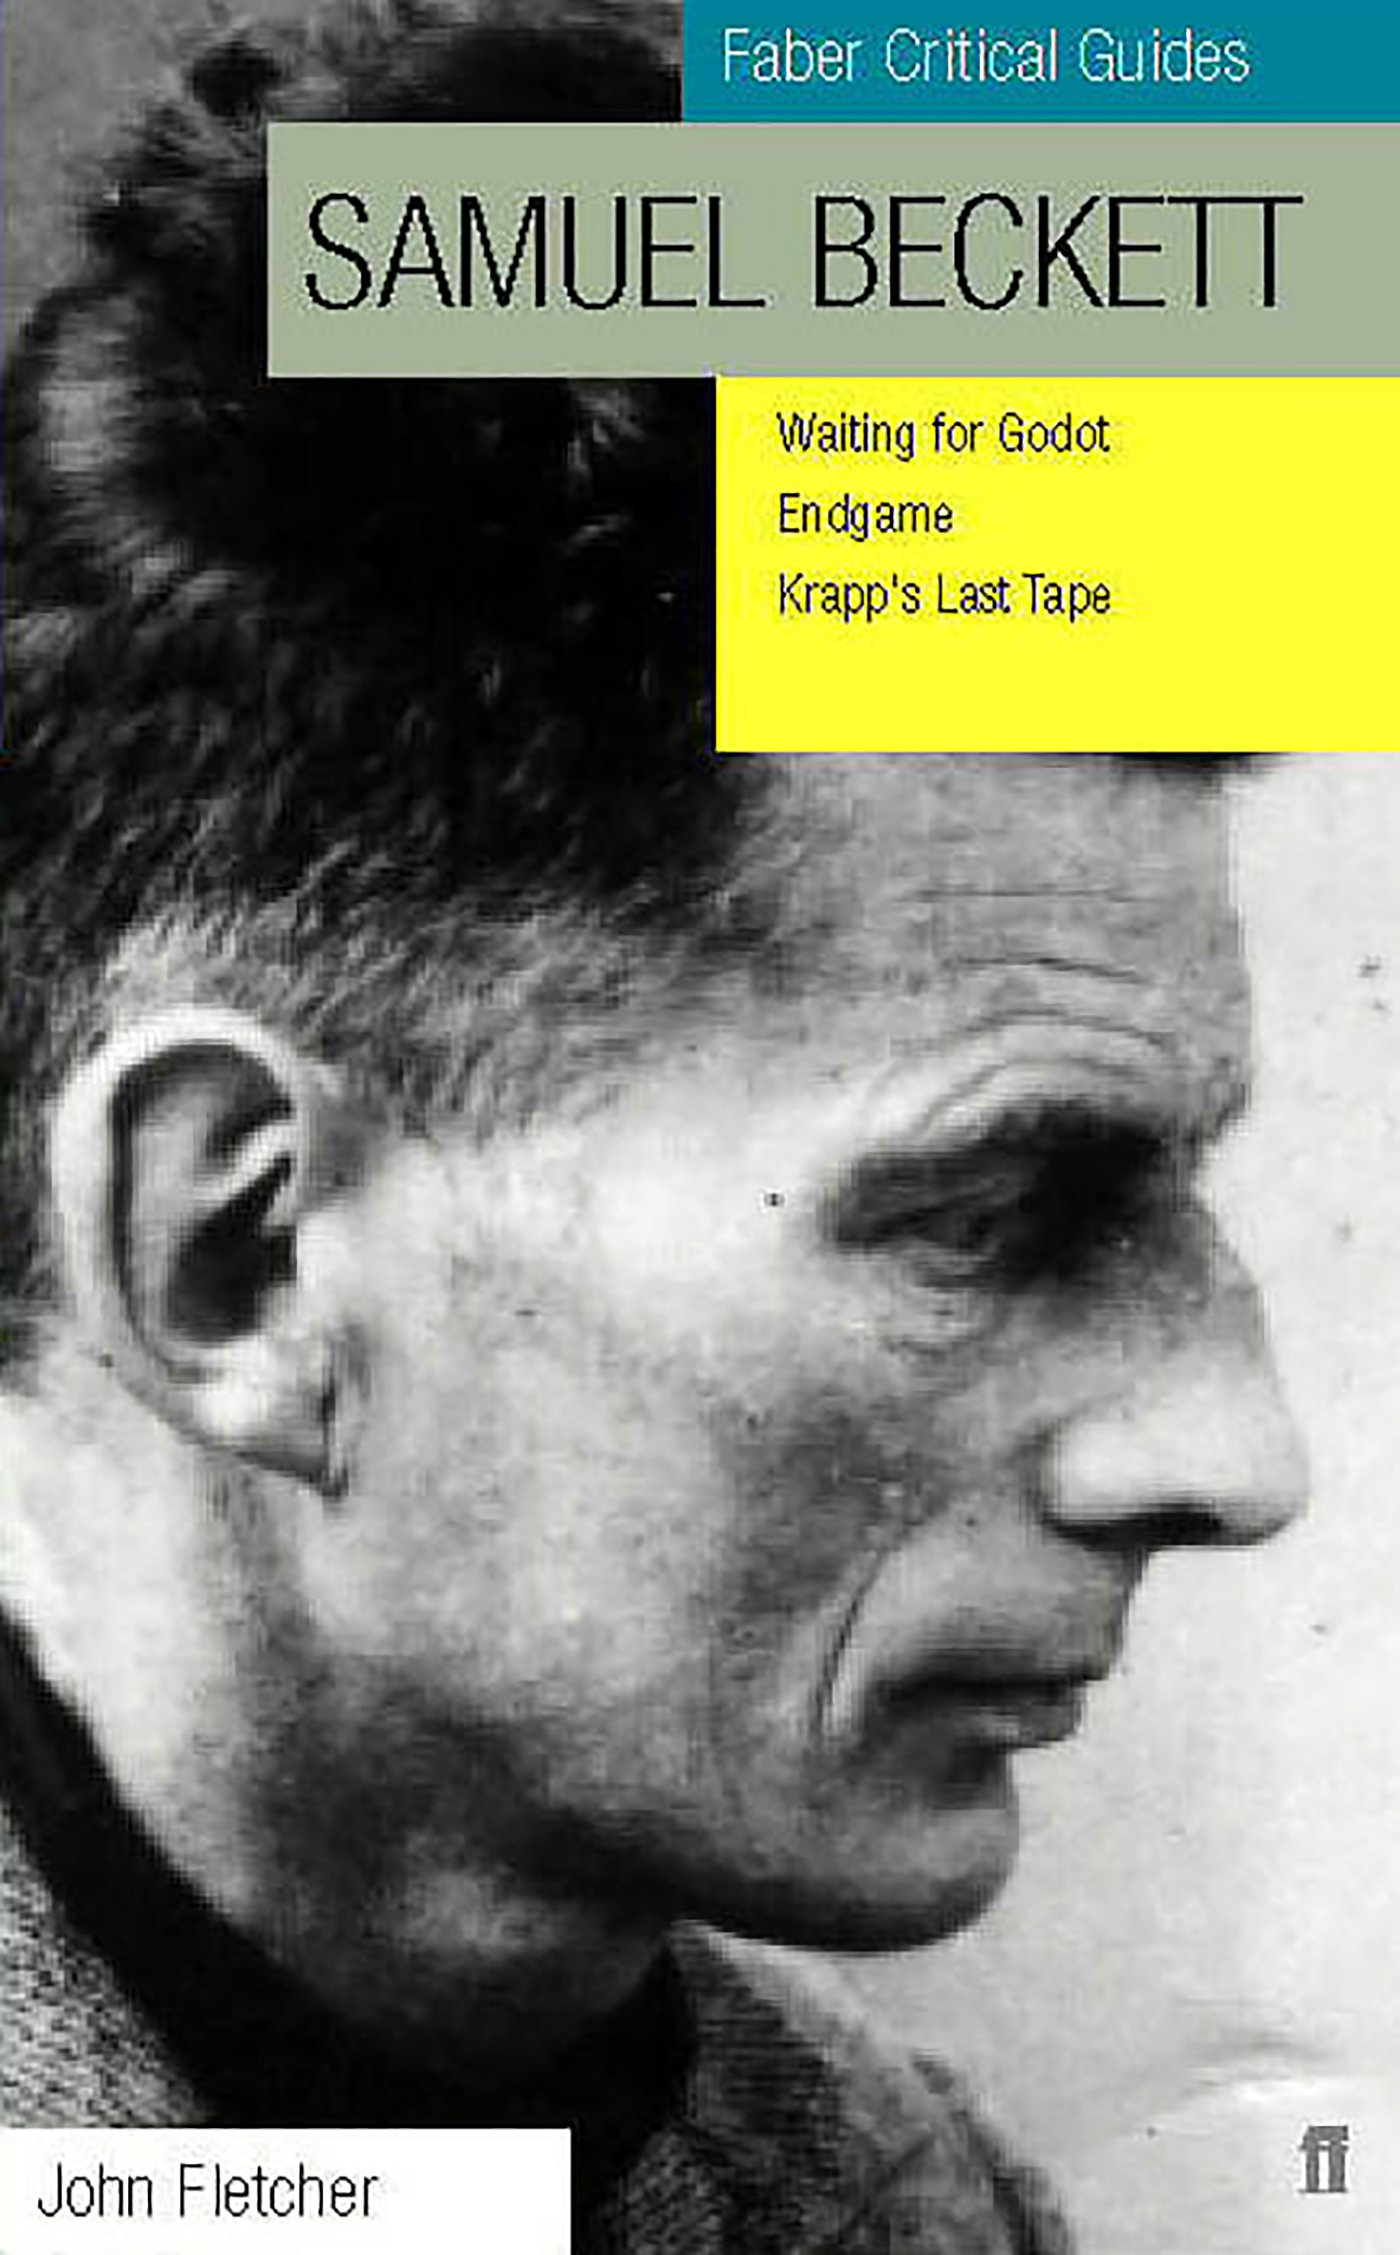 Download Samuel Beckett: Faber Critical Guide (Faber Critical Guides) pdf